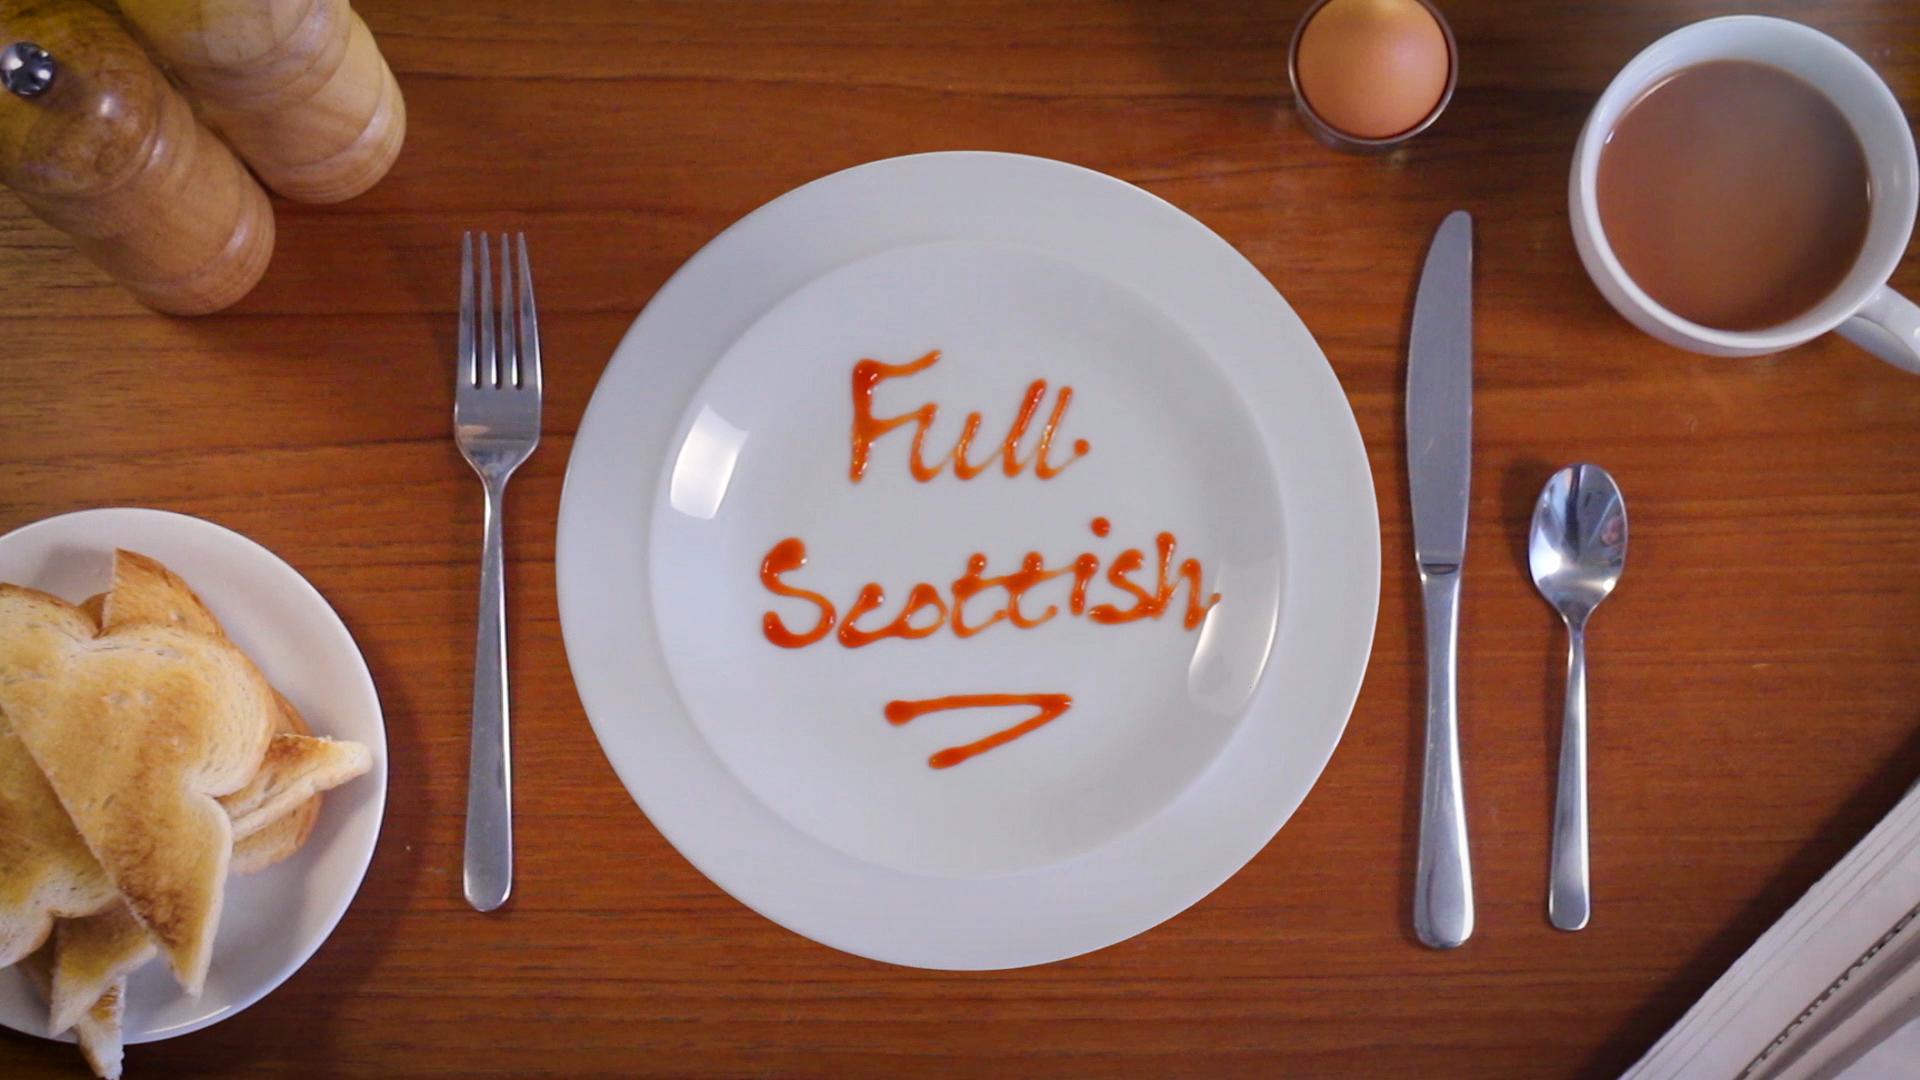 Full Scottish